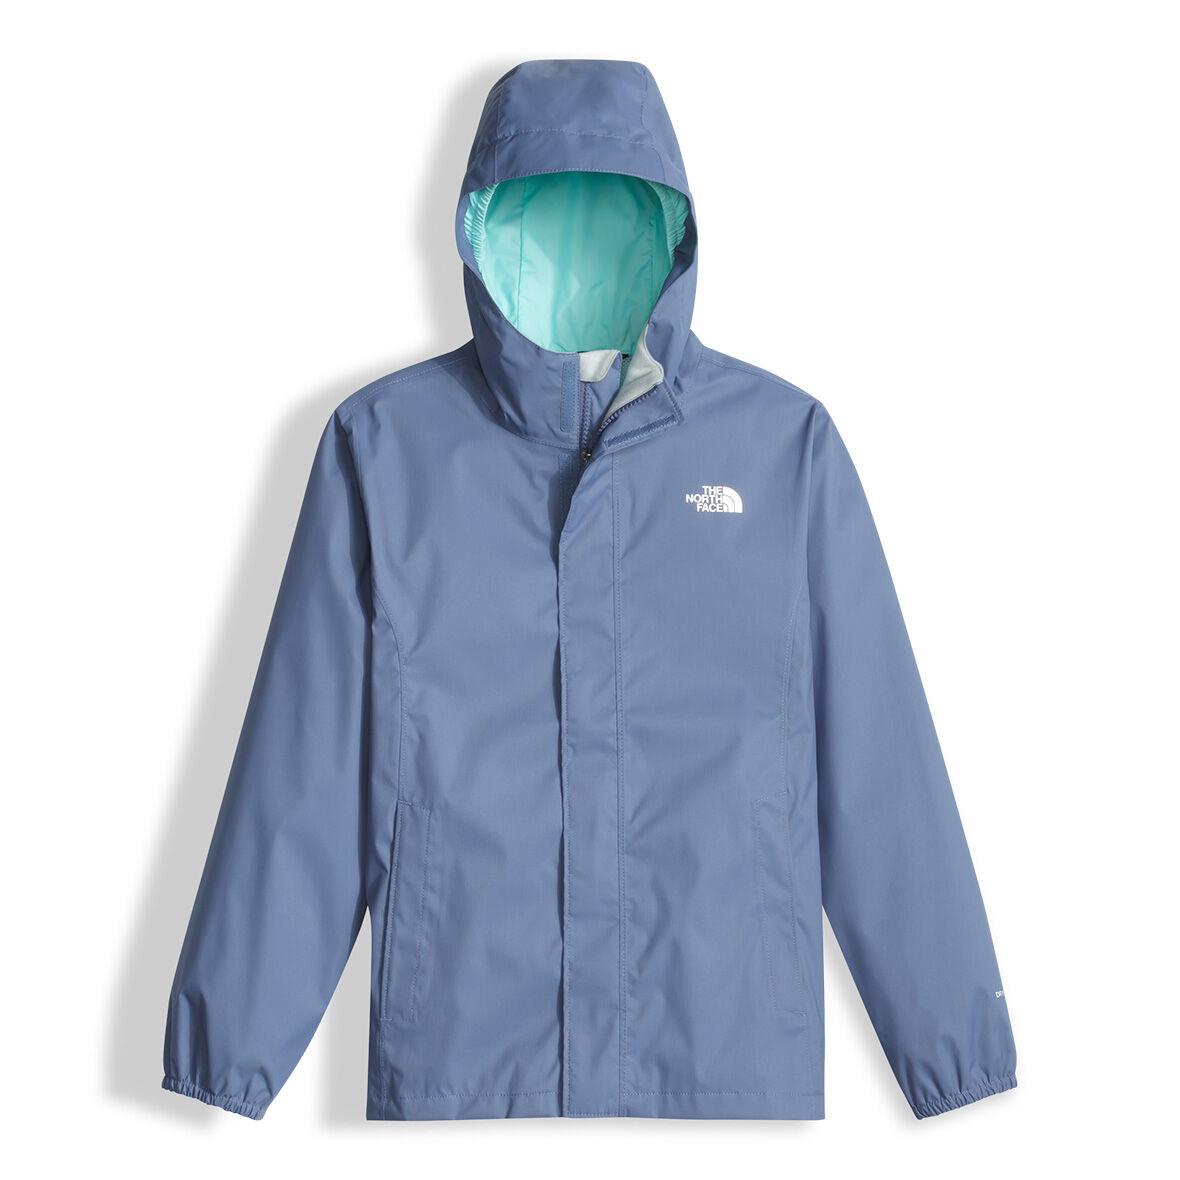 d1beb684d87 Junior girls resolve reflective jacket the north face JPG 700x700 Basic reflective  jacket